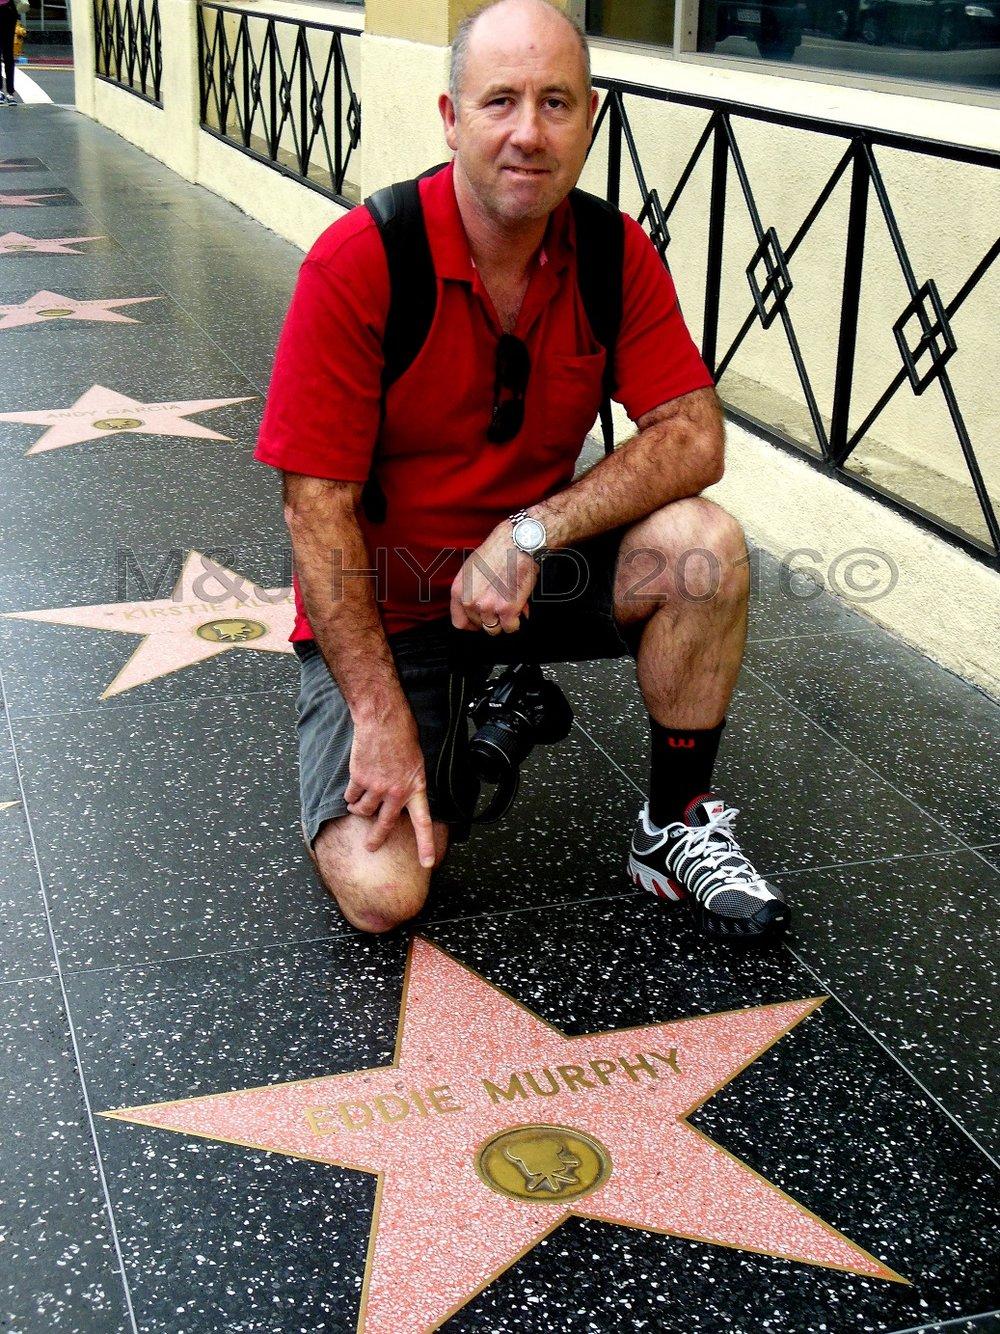 Walk of Fame, Hollywood, LA, USA